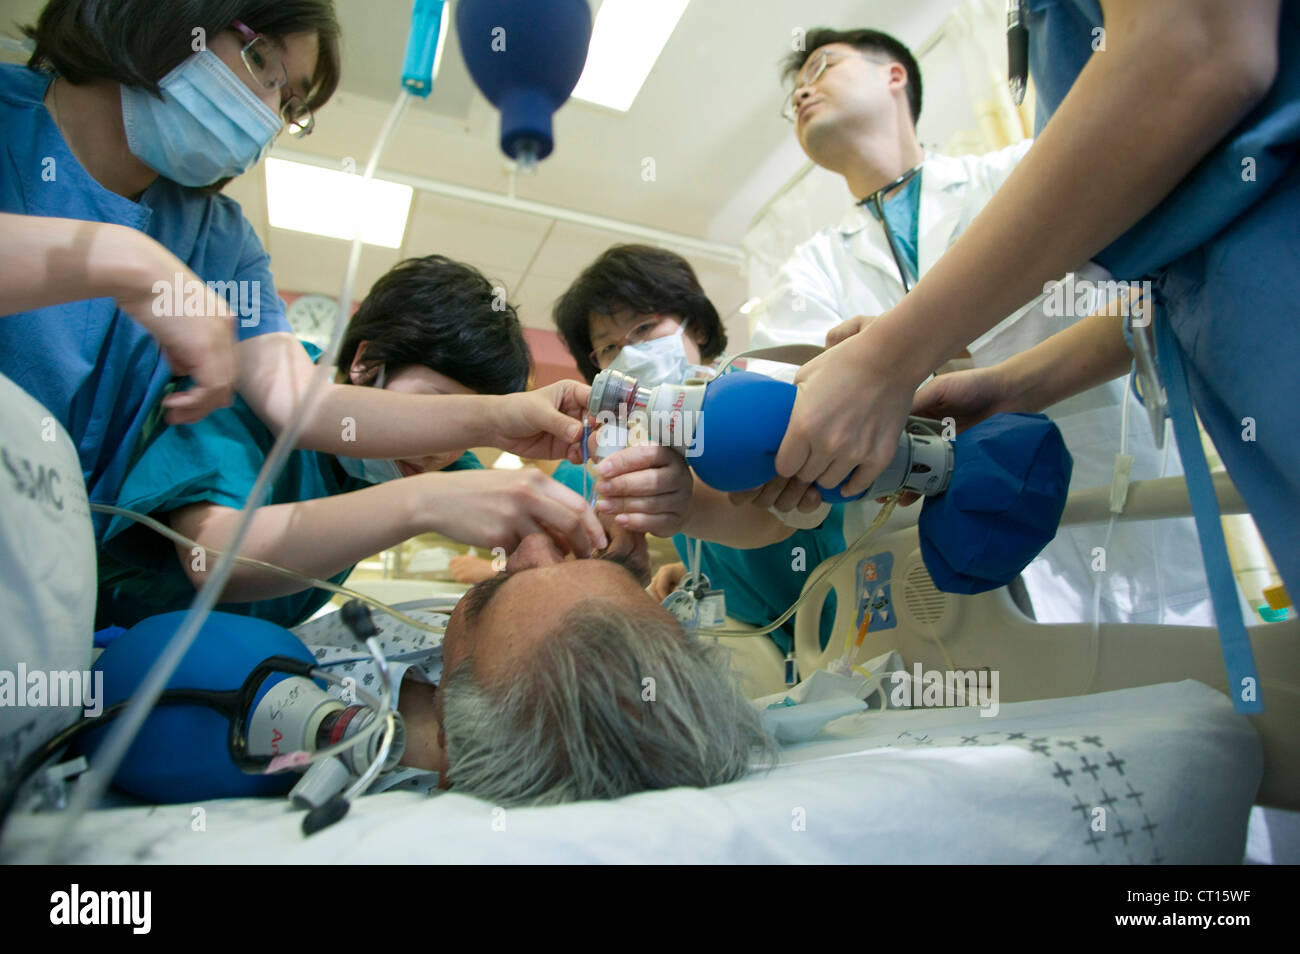 oxygen tank patient life saving medical staff intensive care intensive care unit ICU Samsung Medical Centre Samsung - Stock Image